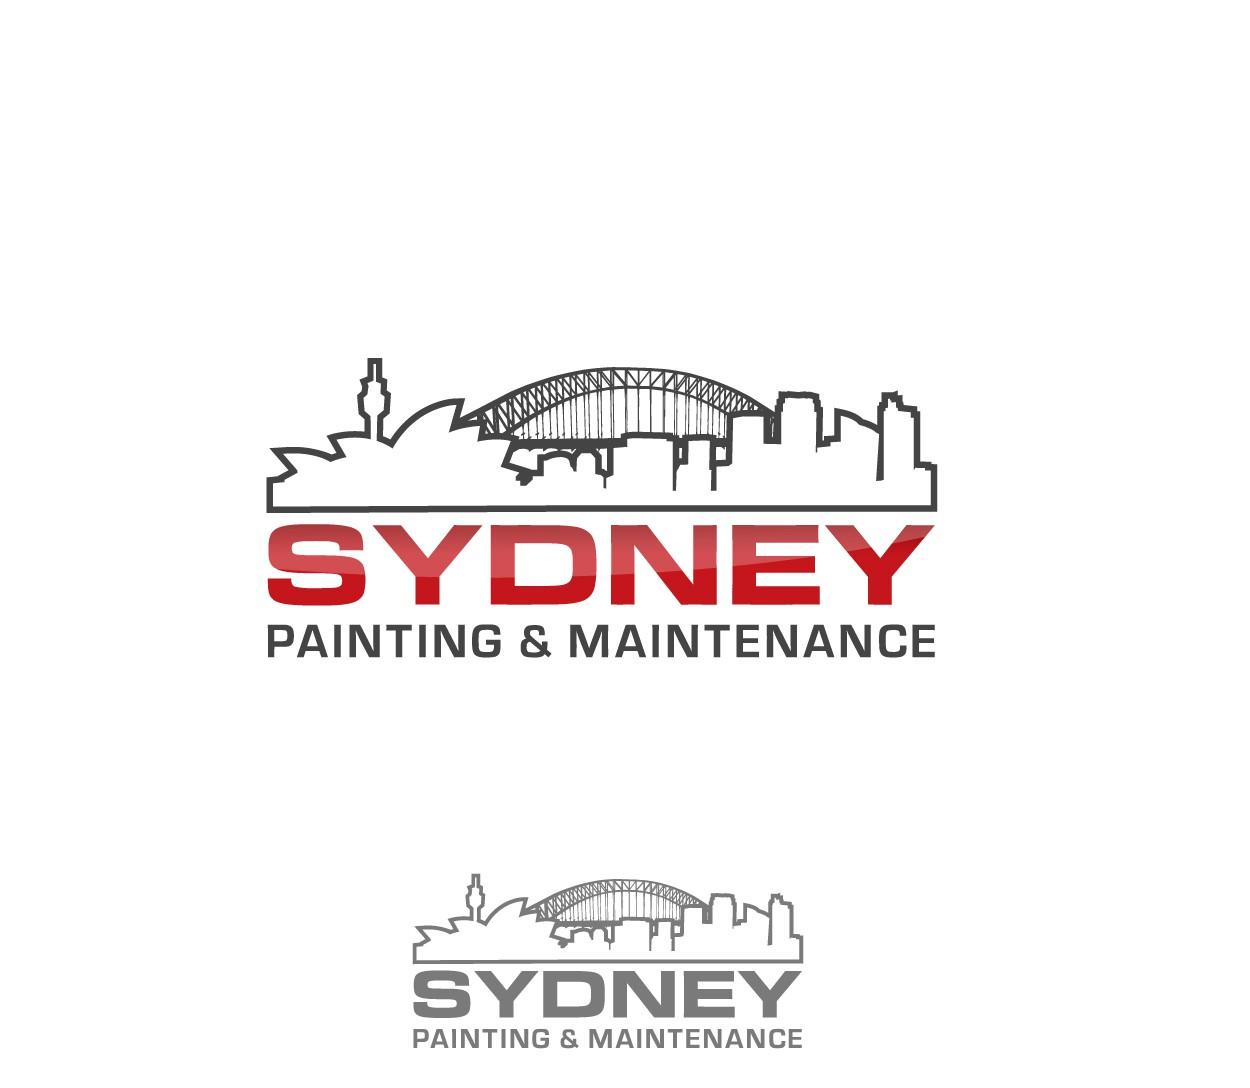 sydney painting & maintenance needs a new logo